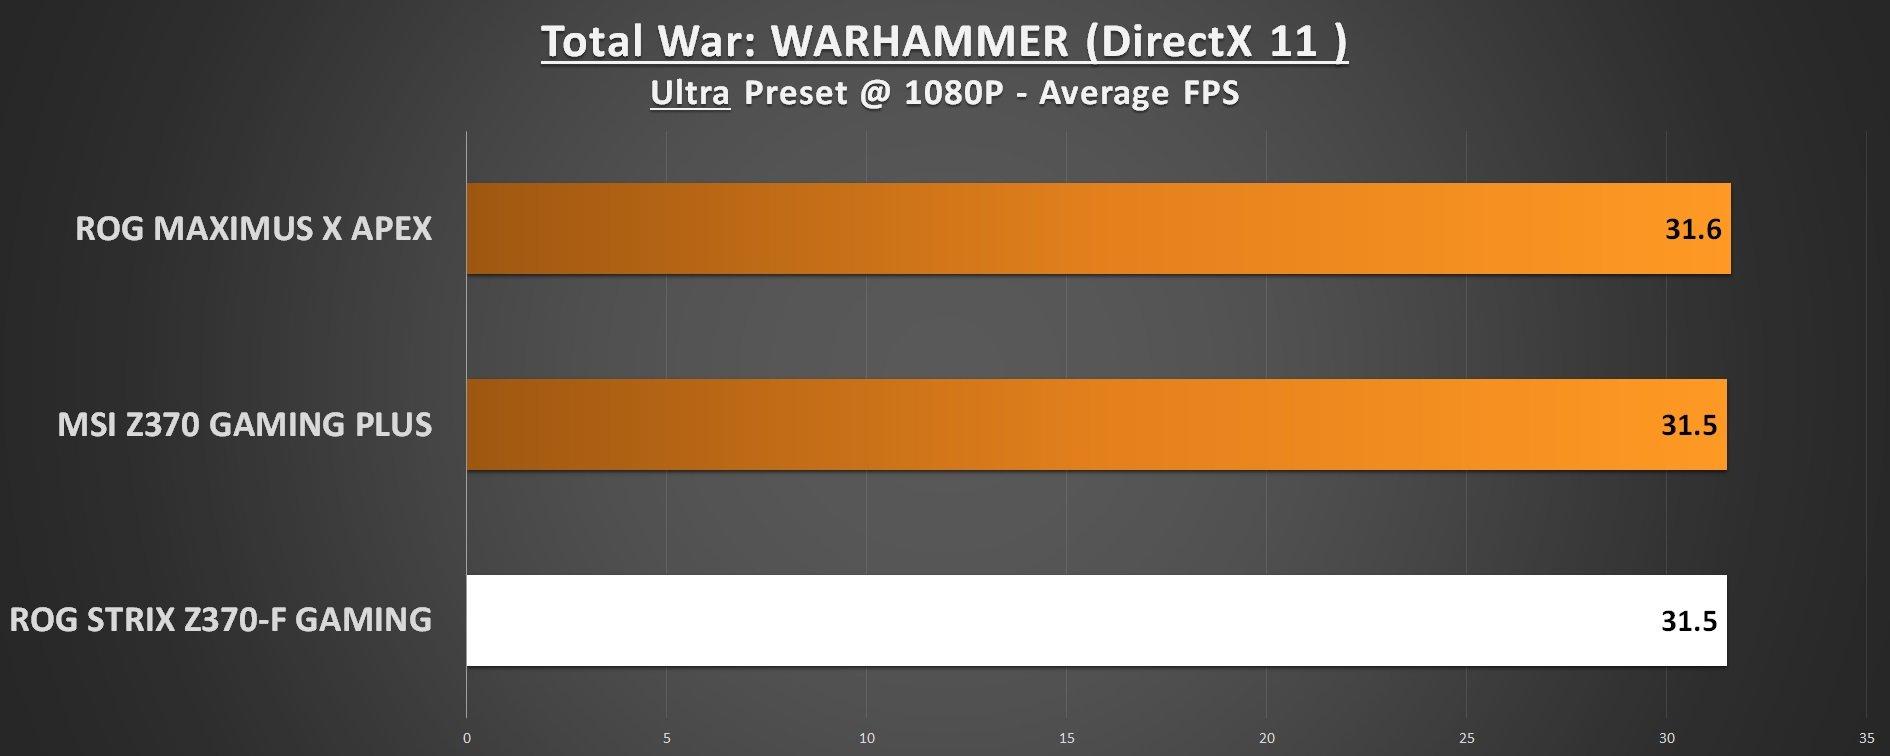 ROG STRIX Z370-F Gaming Total War Warhammer